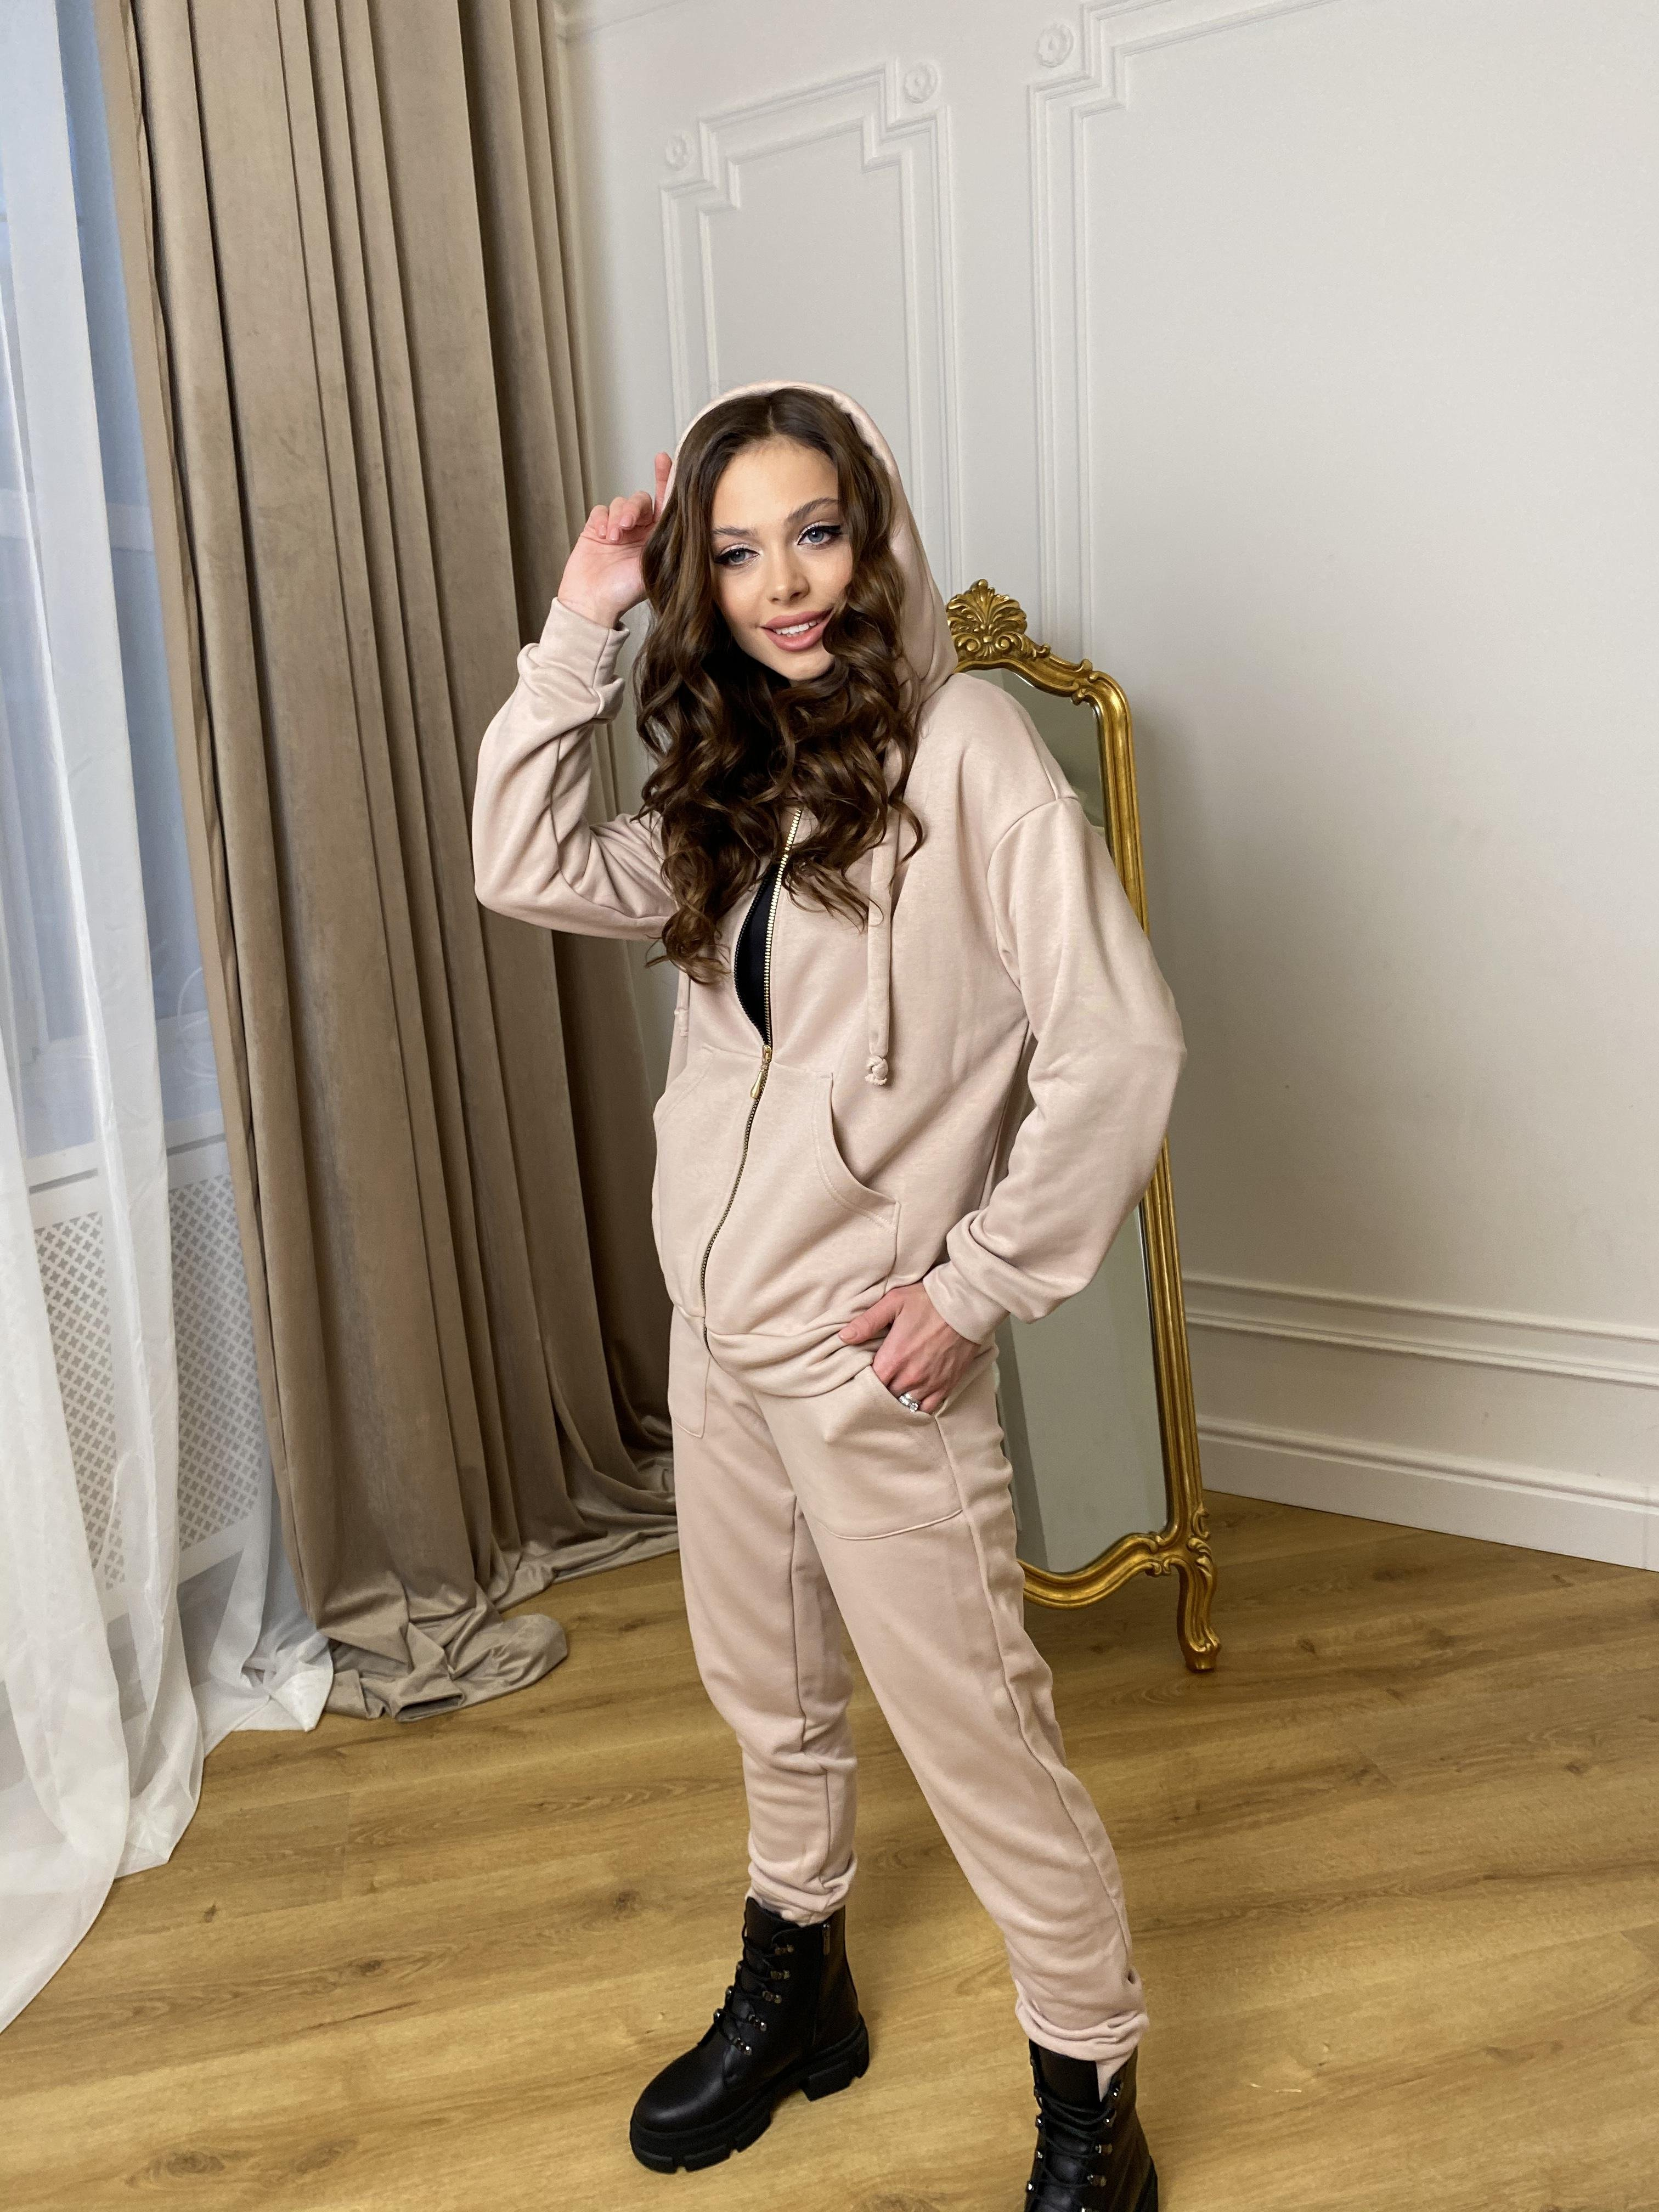 Брокер костюм  из 3х нитки  9634 АРТ. 45981 Цвет: Бежевый - фото 11, интернет магазин tm-modus.ru